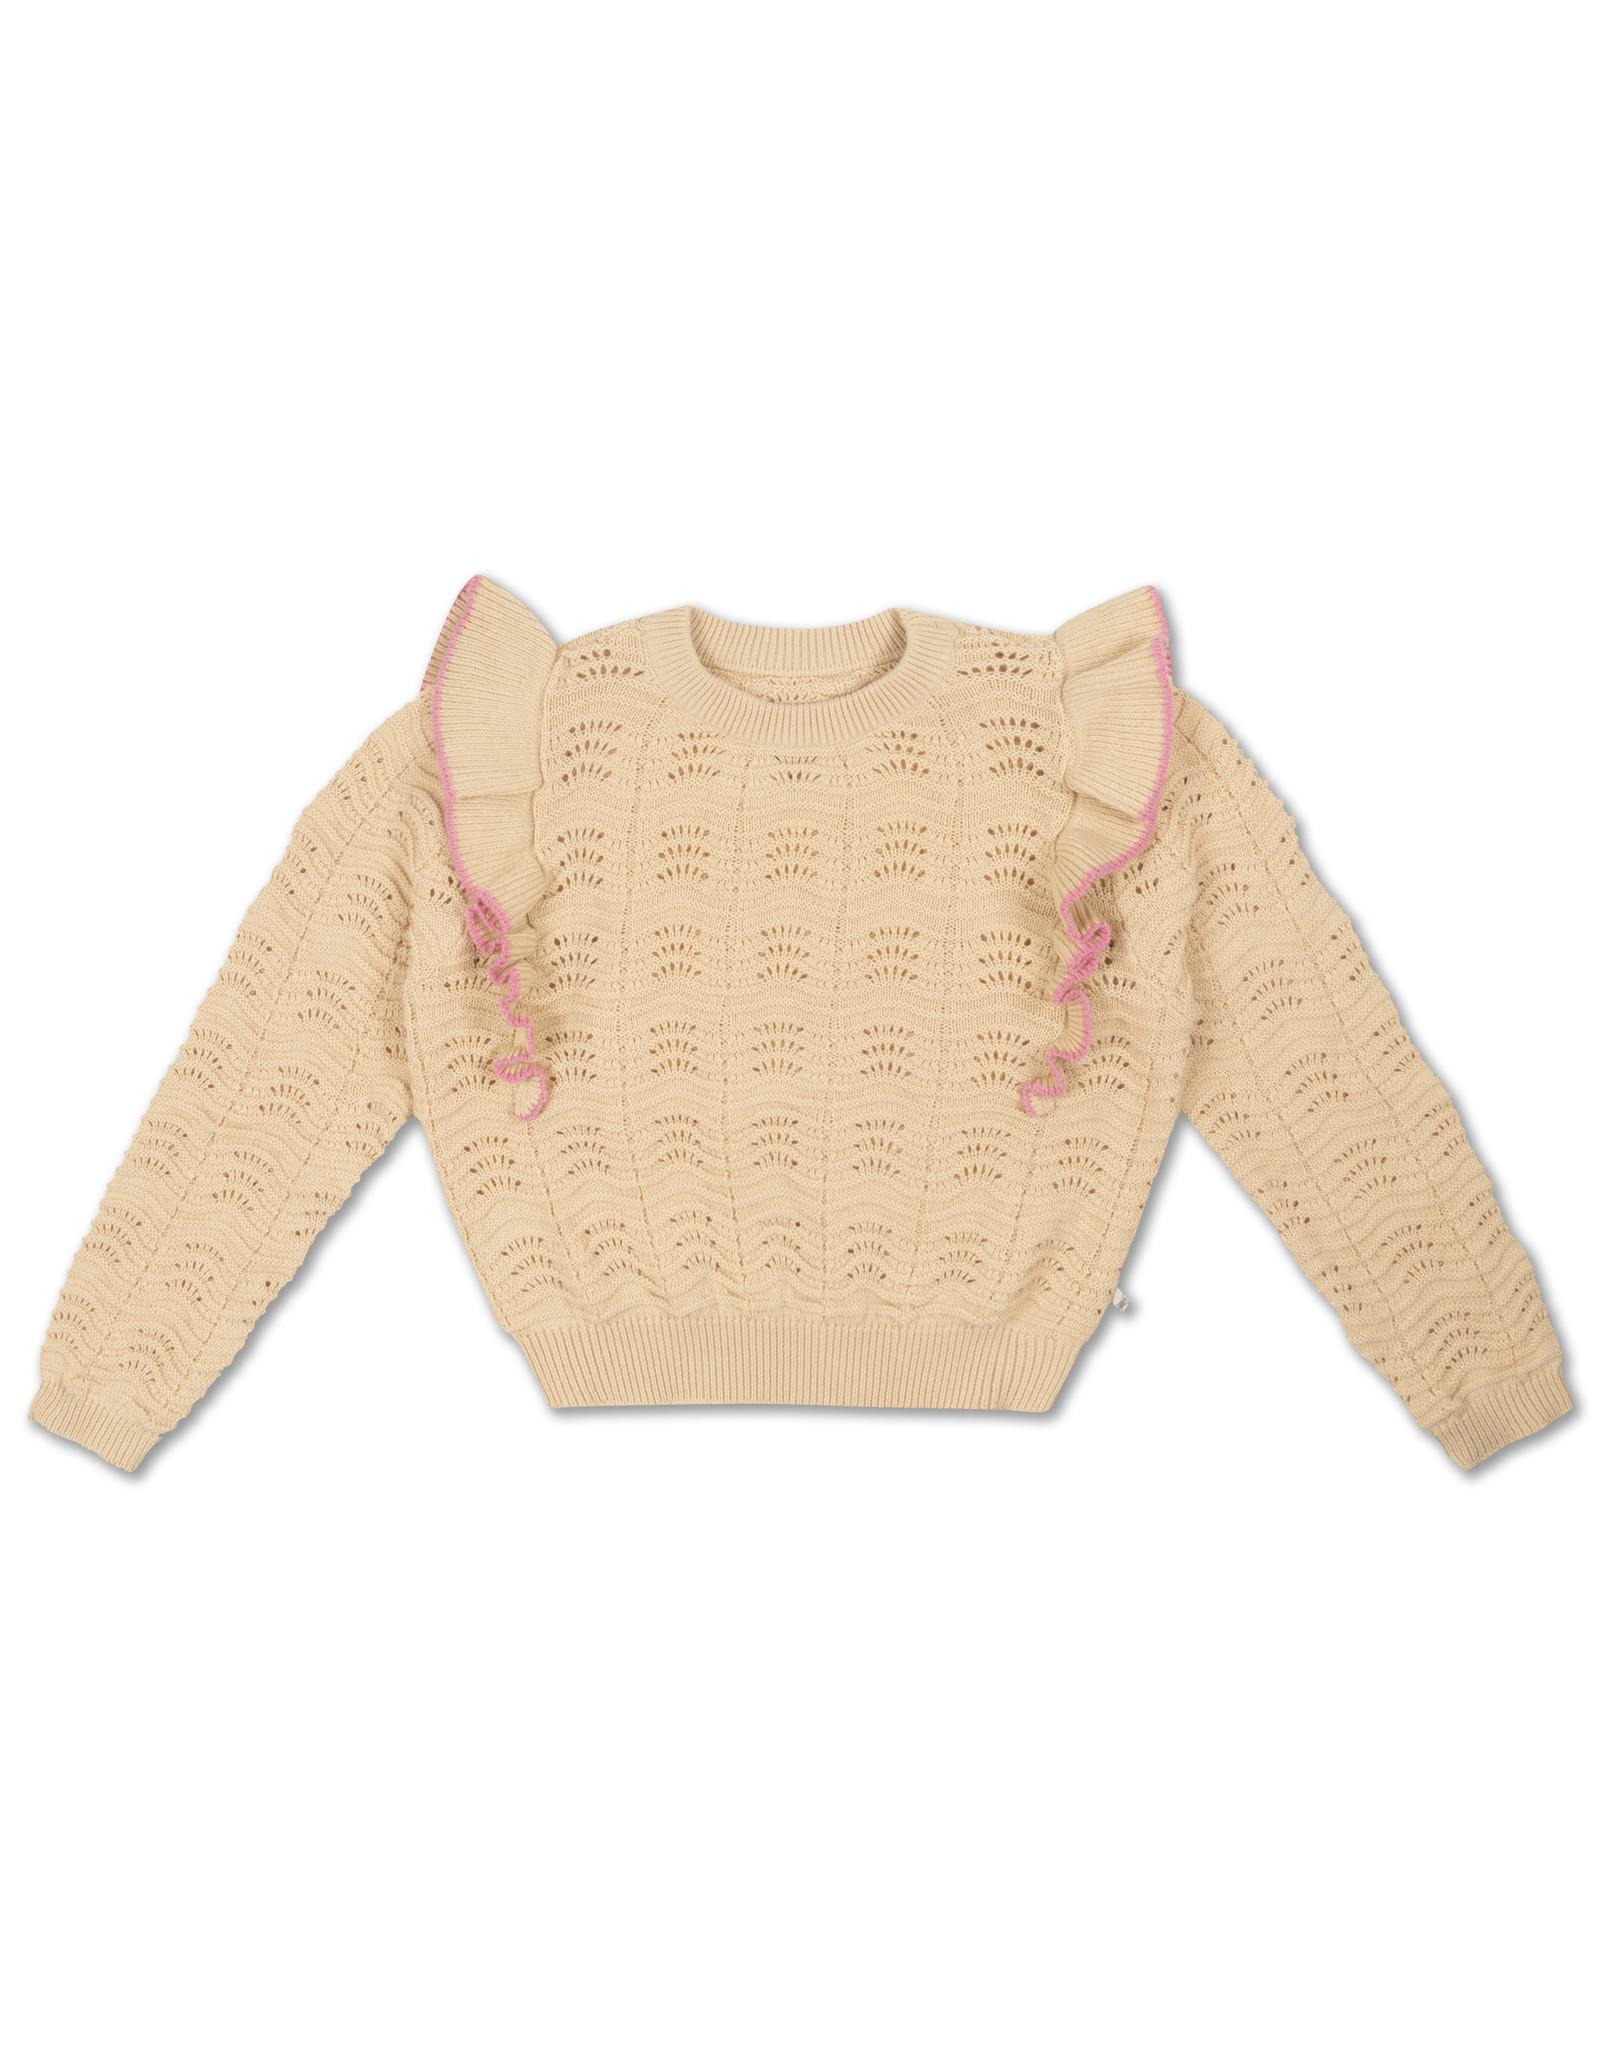 Repose Repose SS21 61 Knit Sweater vintage white